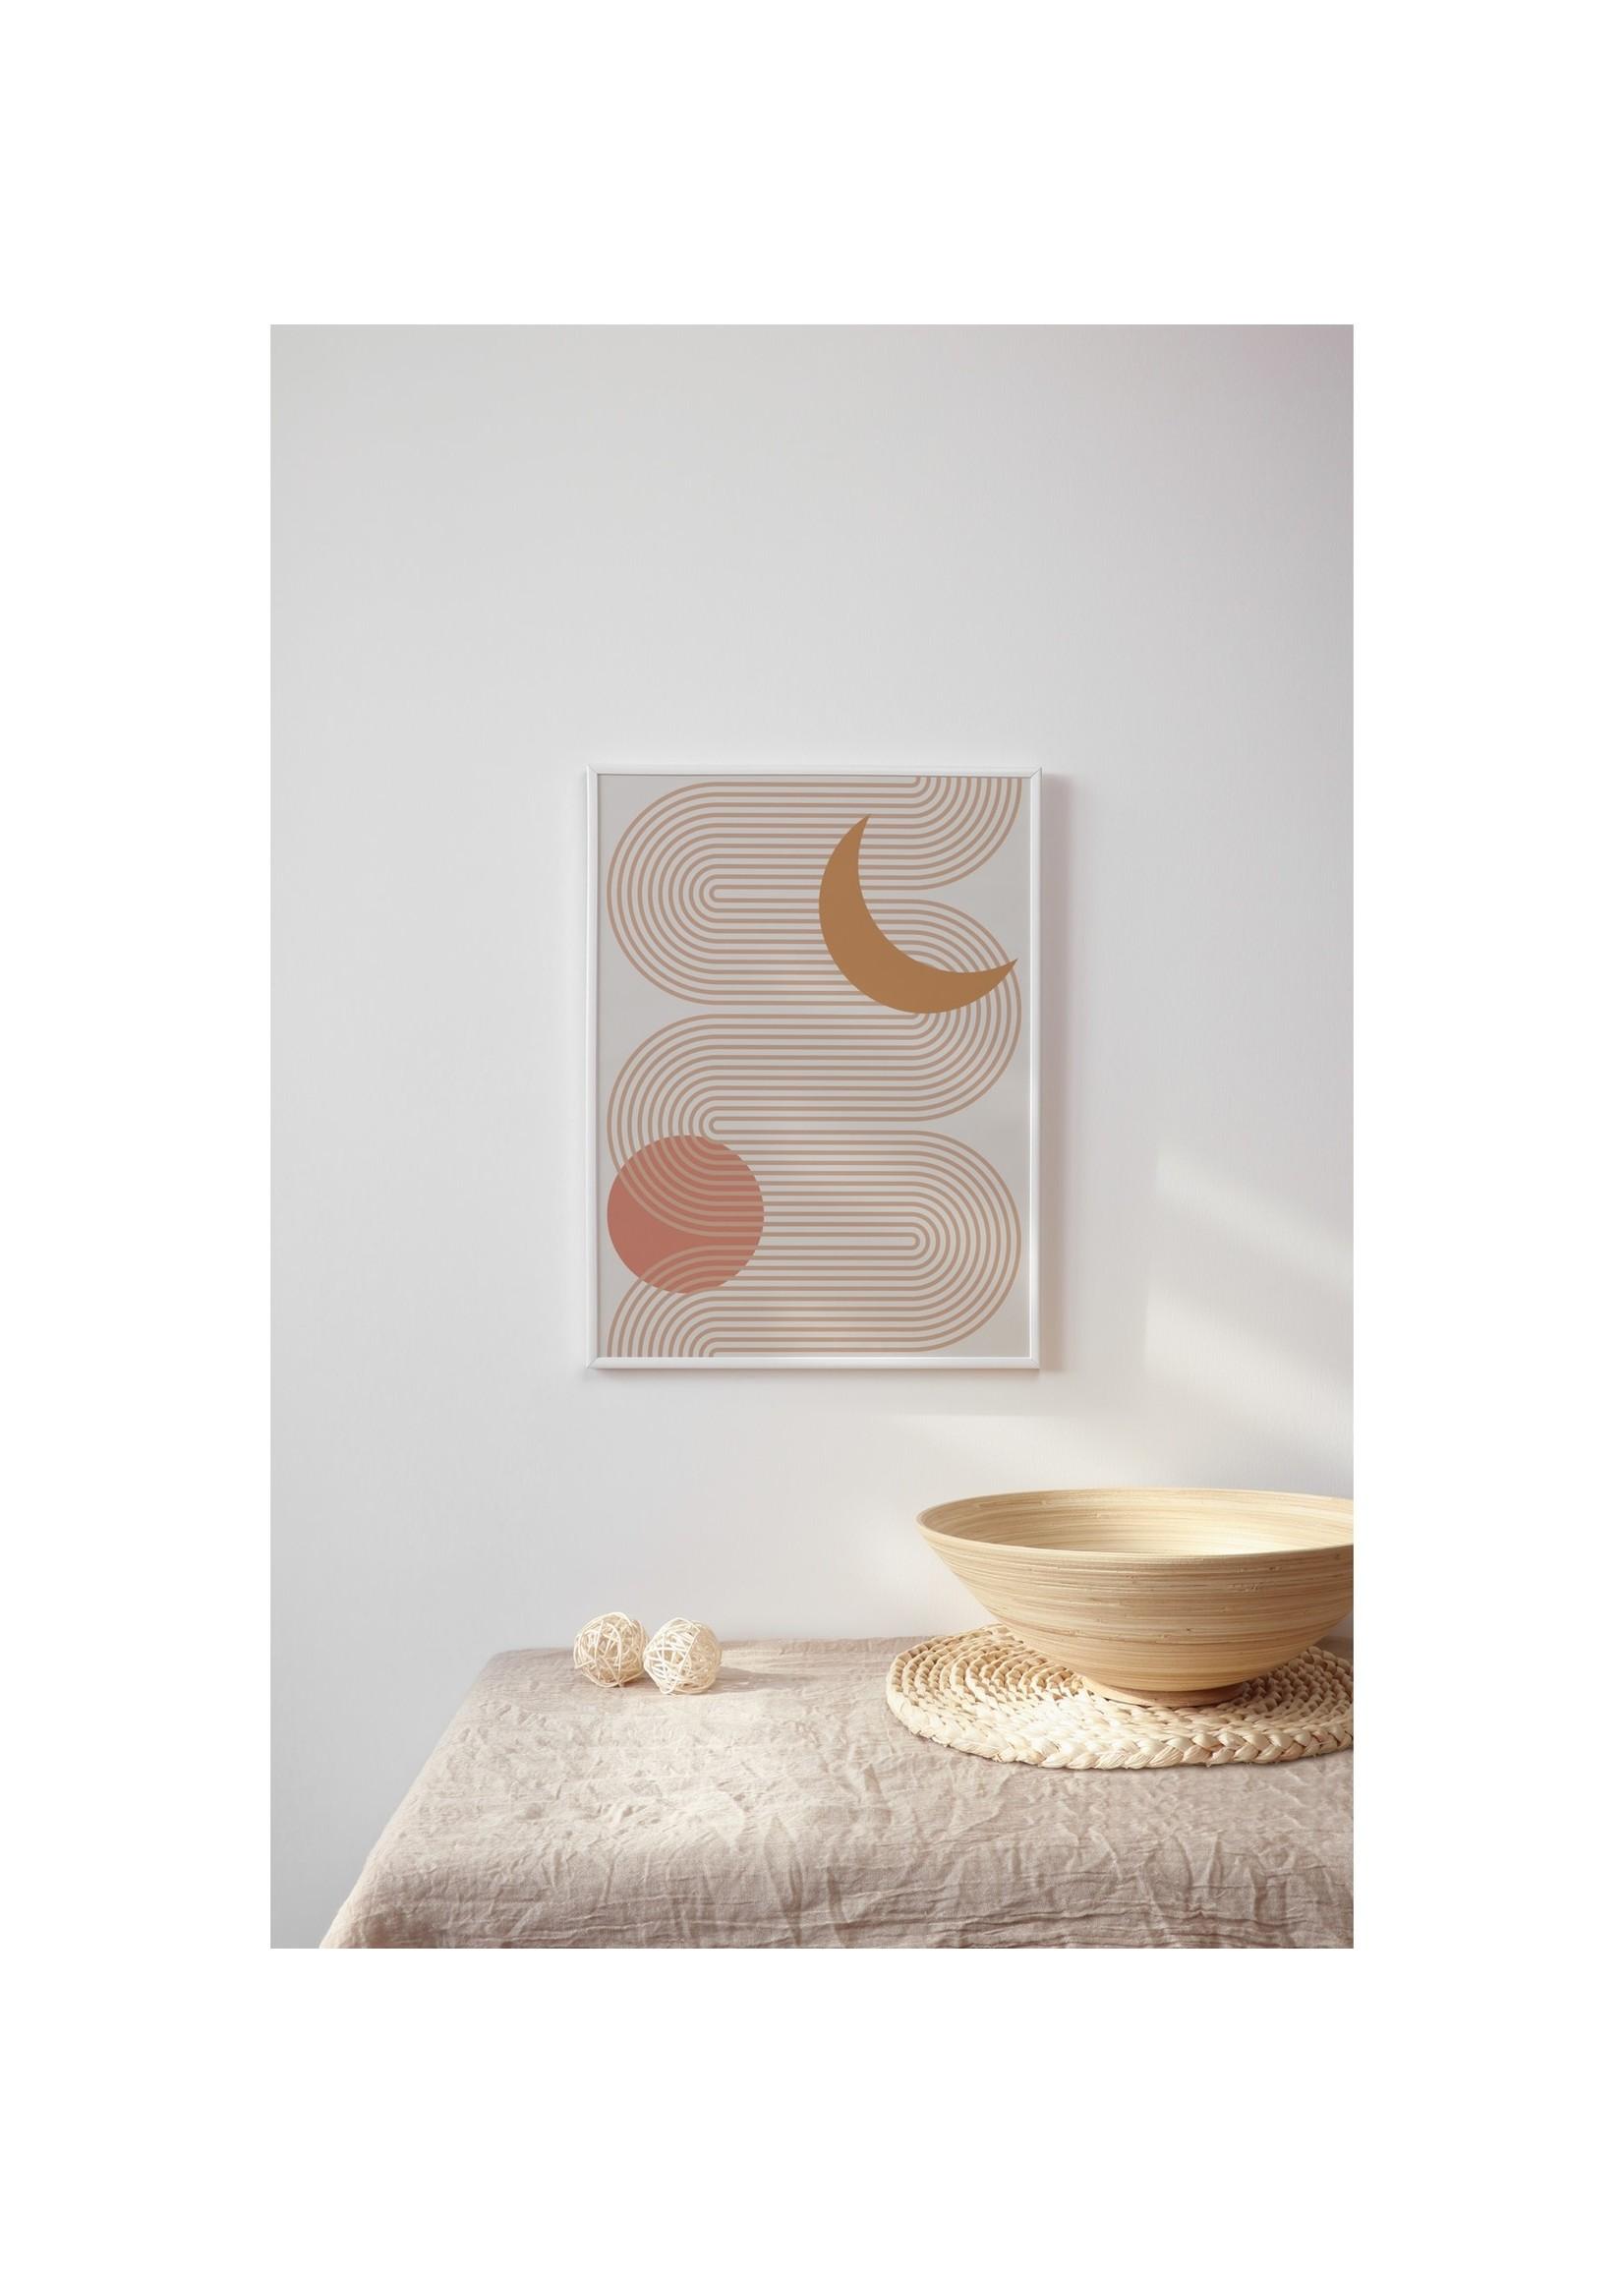 "Sam's Simple Decor Abstract Line Art Sun and Moon Print 8x10"""